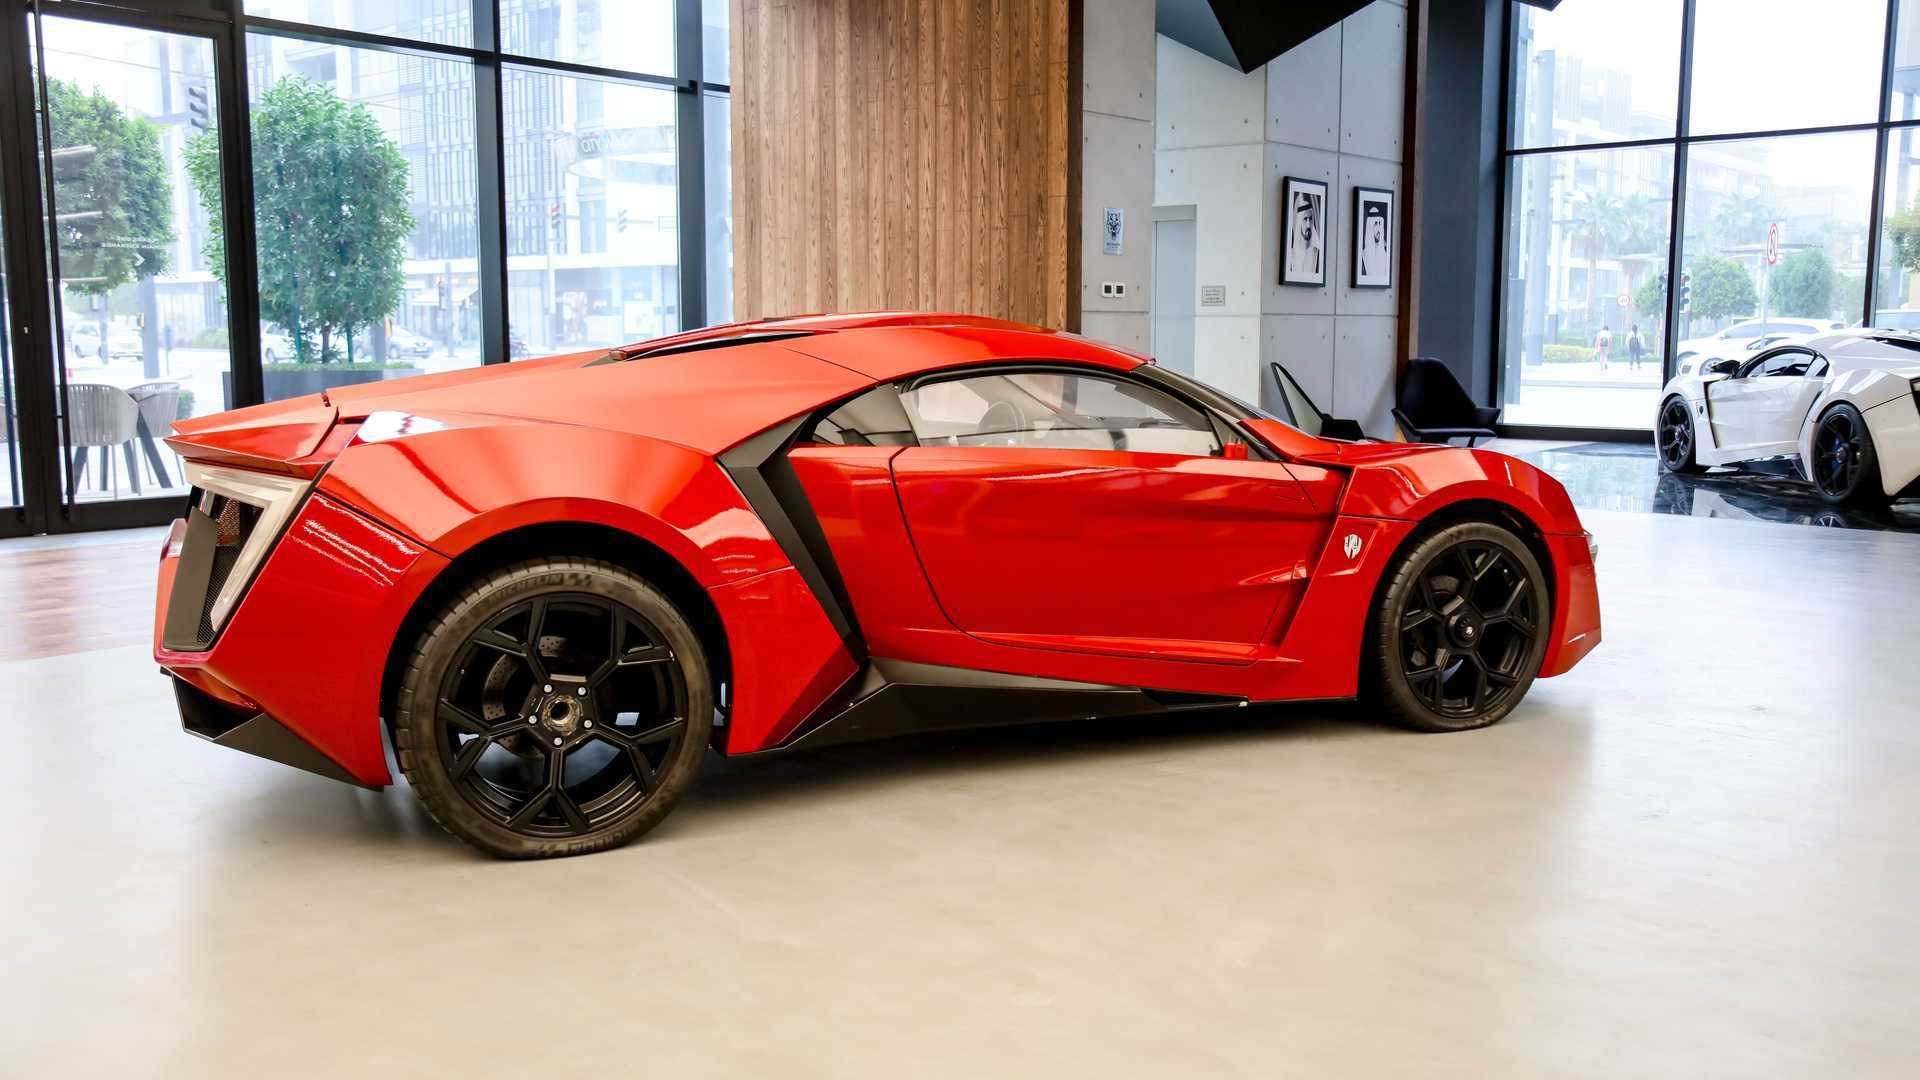 Lykan_HyperSport_stunt_car_sale-0007